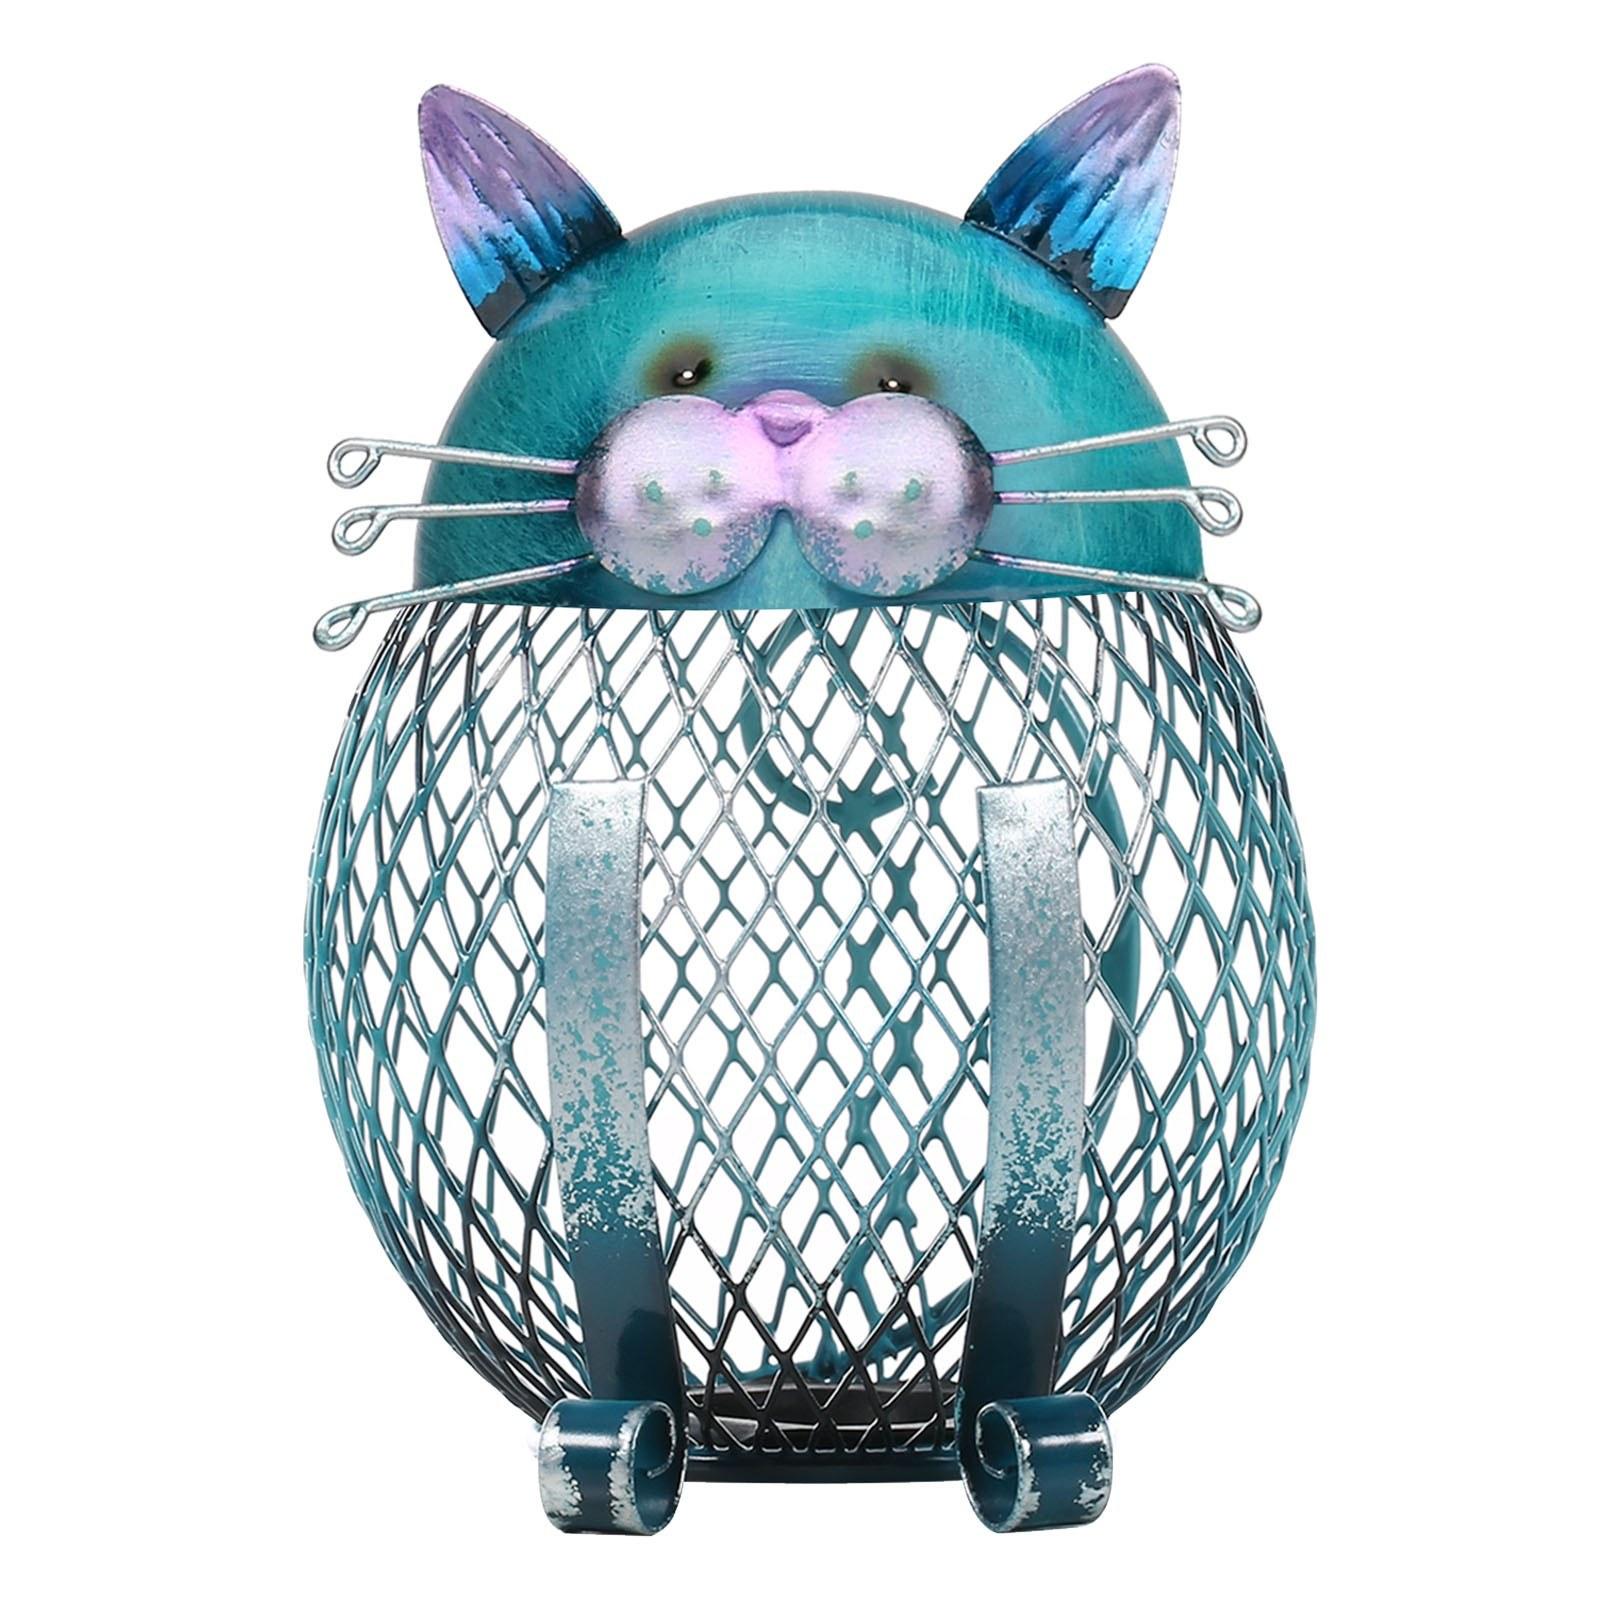 Cafago - 55% OFF TOOARTS Cat coin box Piggy bank Animal ornament Creative ornament,free shipping+$13.14